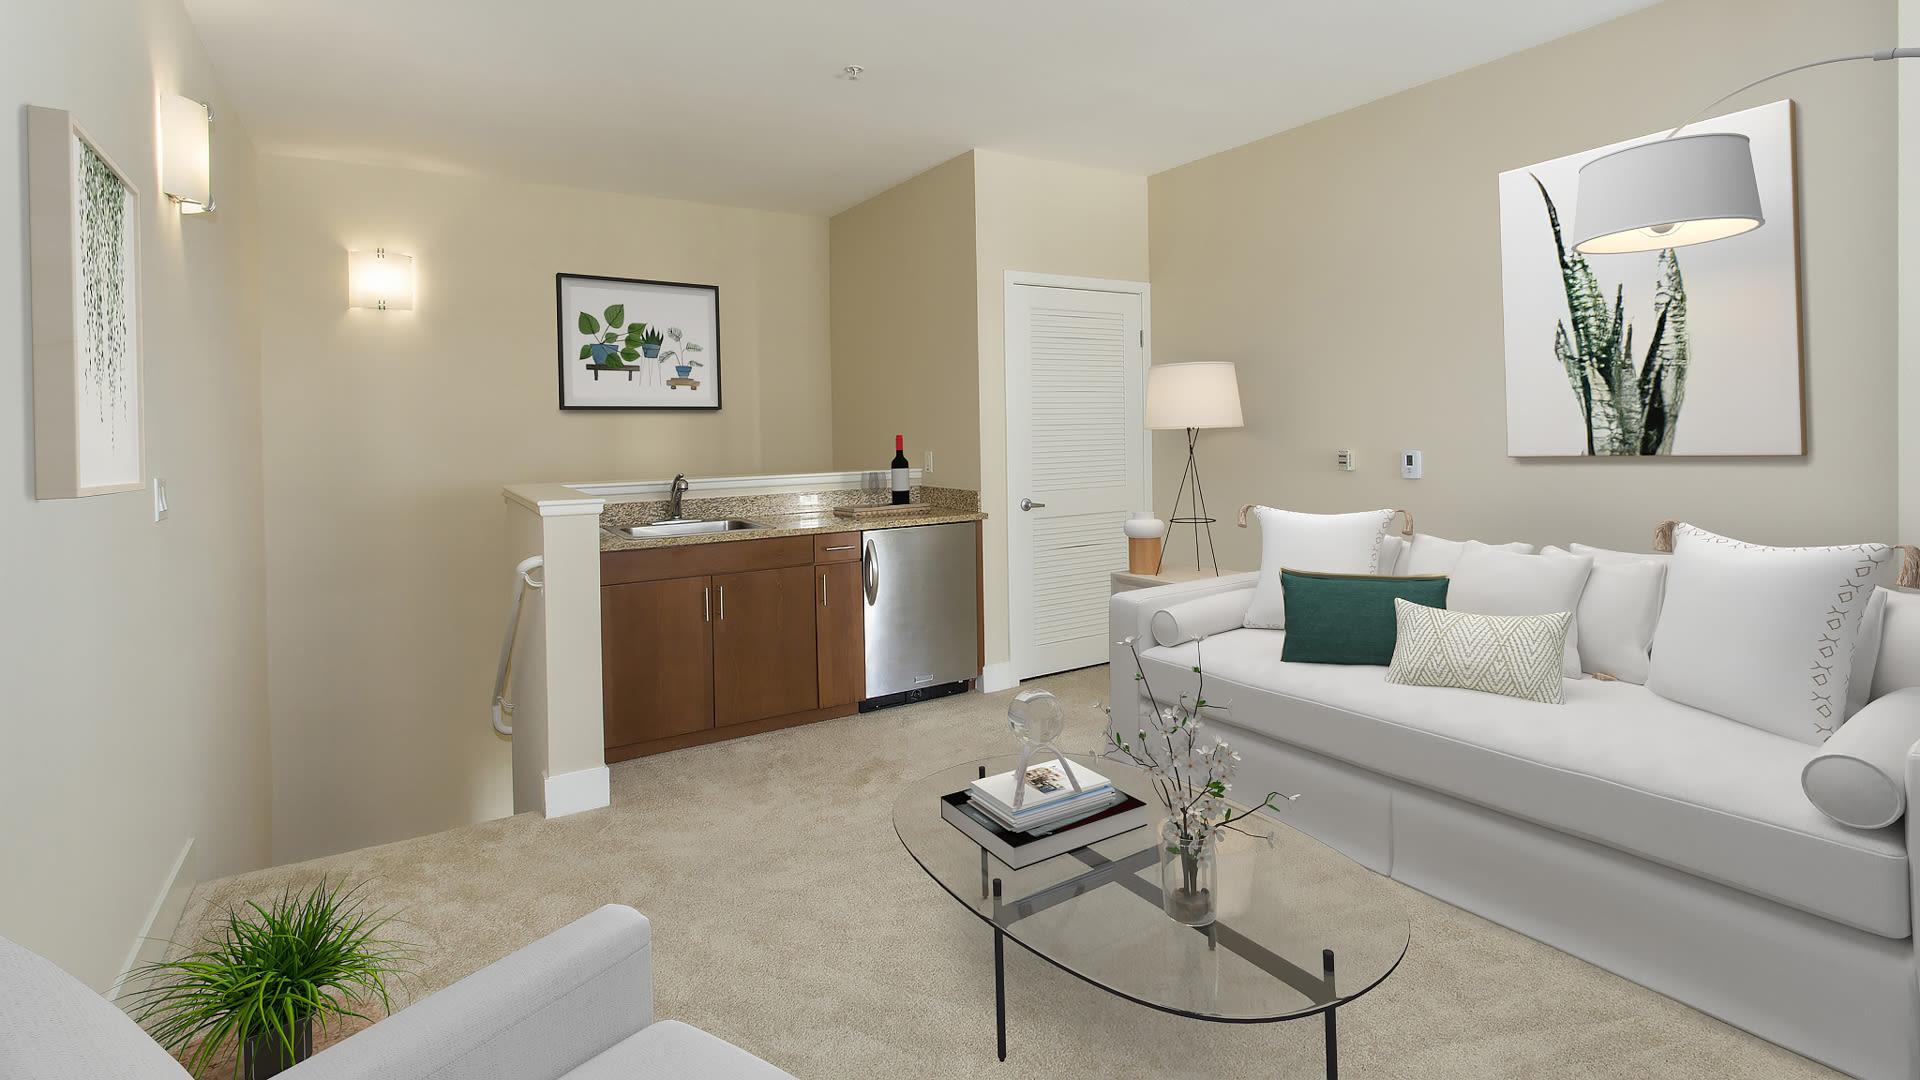 Westgate Apartments - Loft Style Living Space